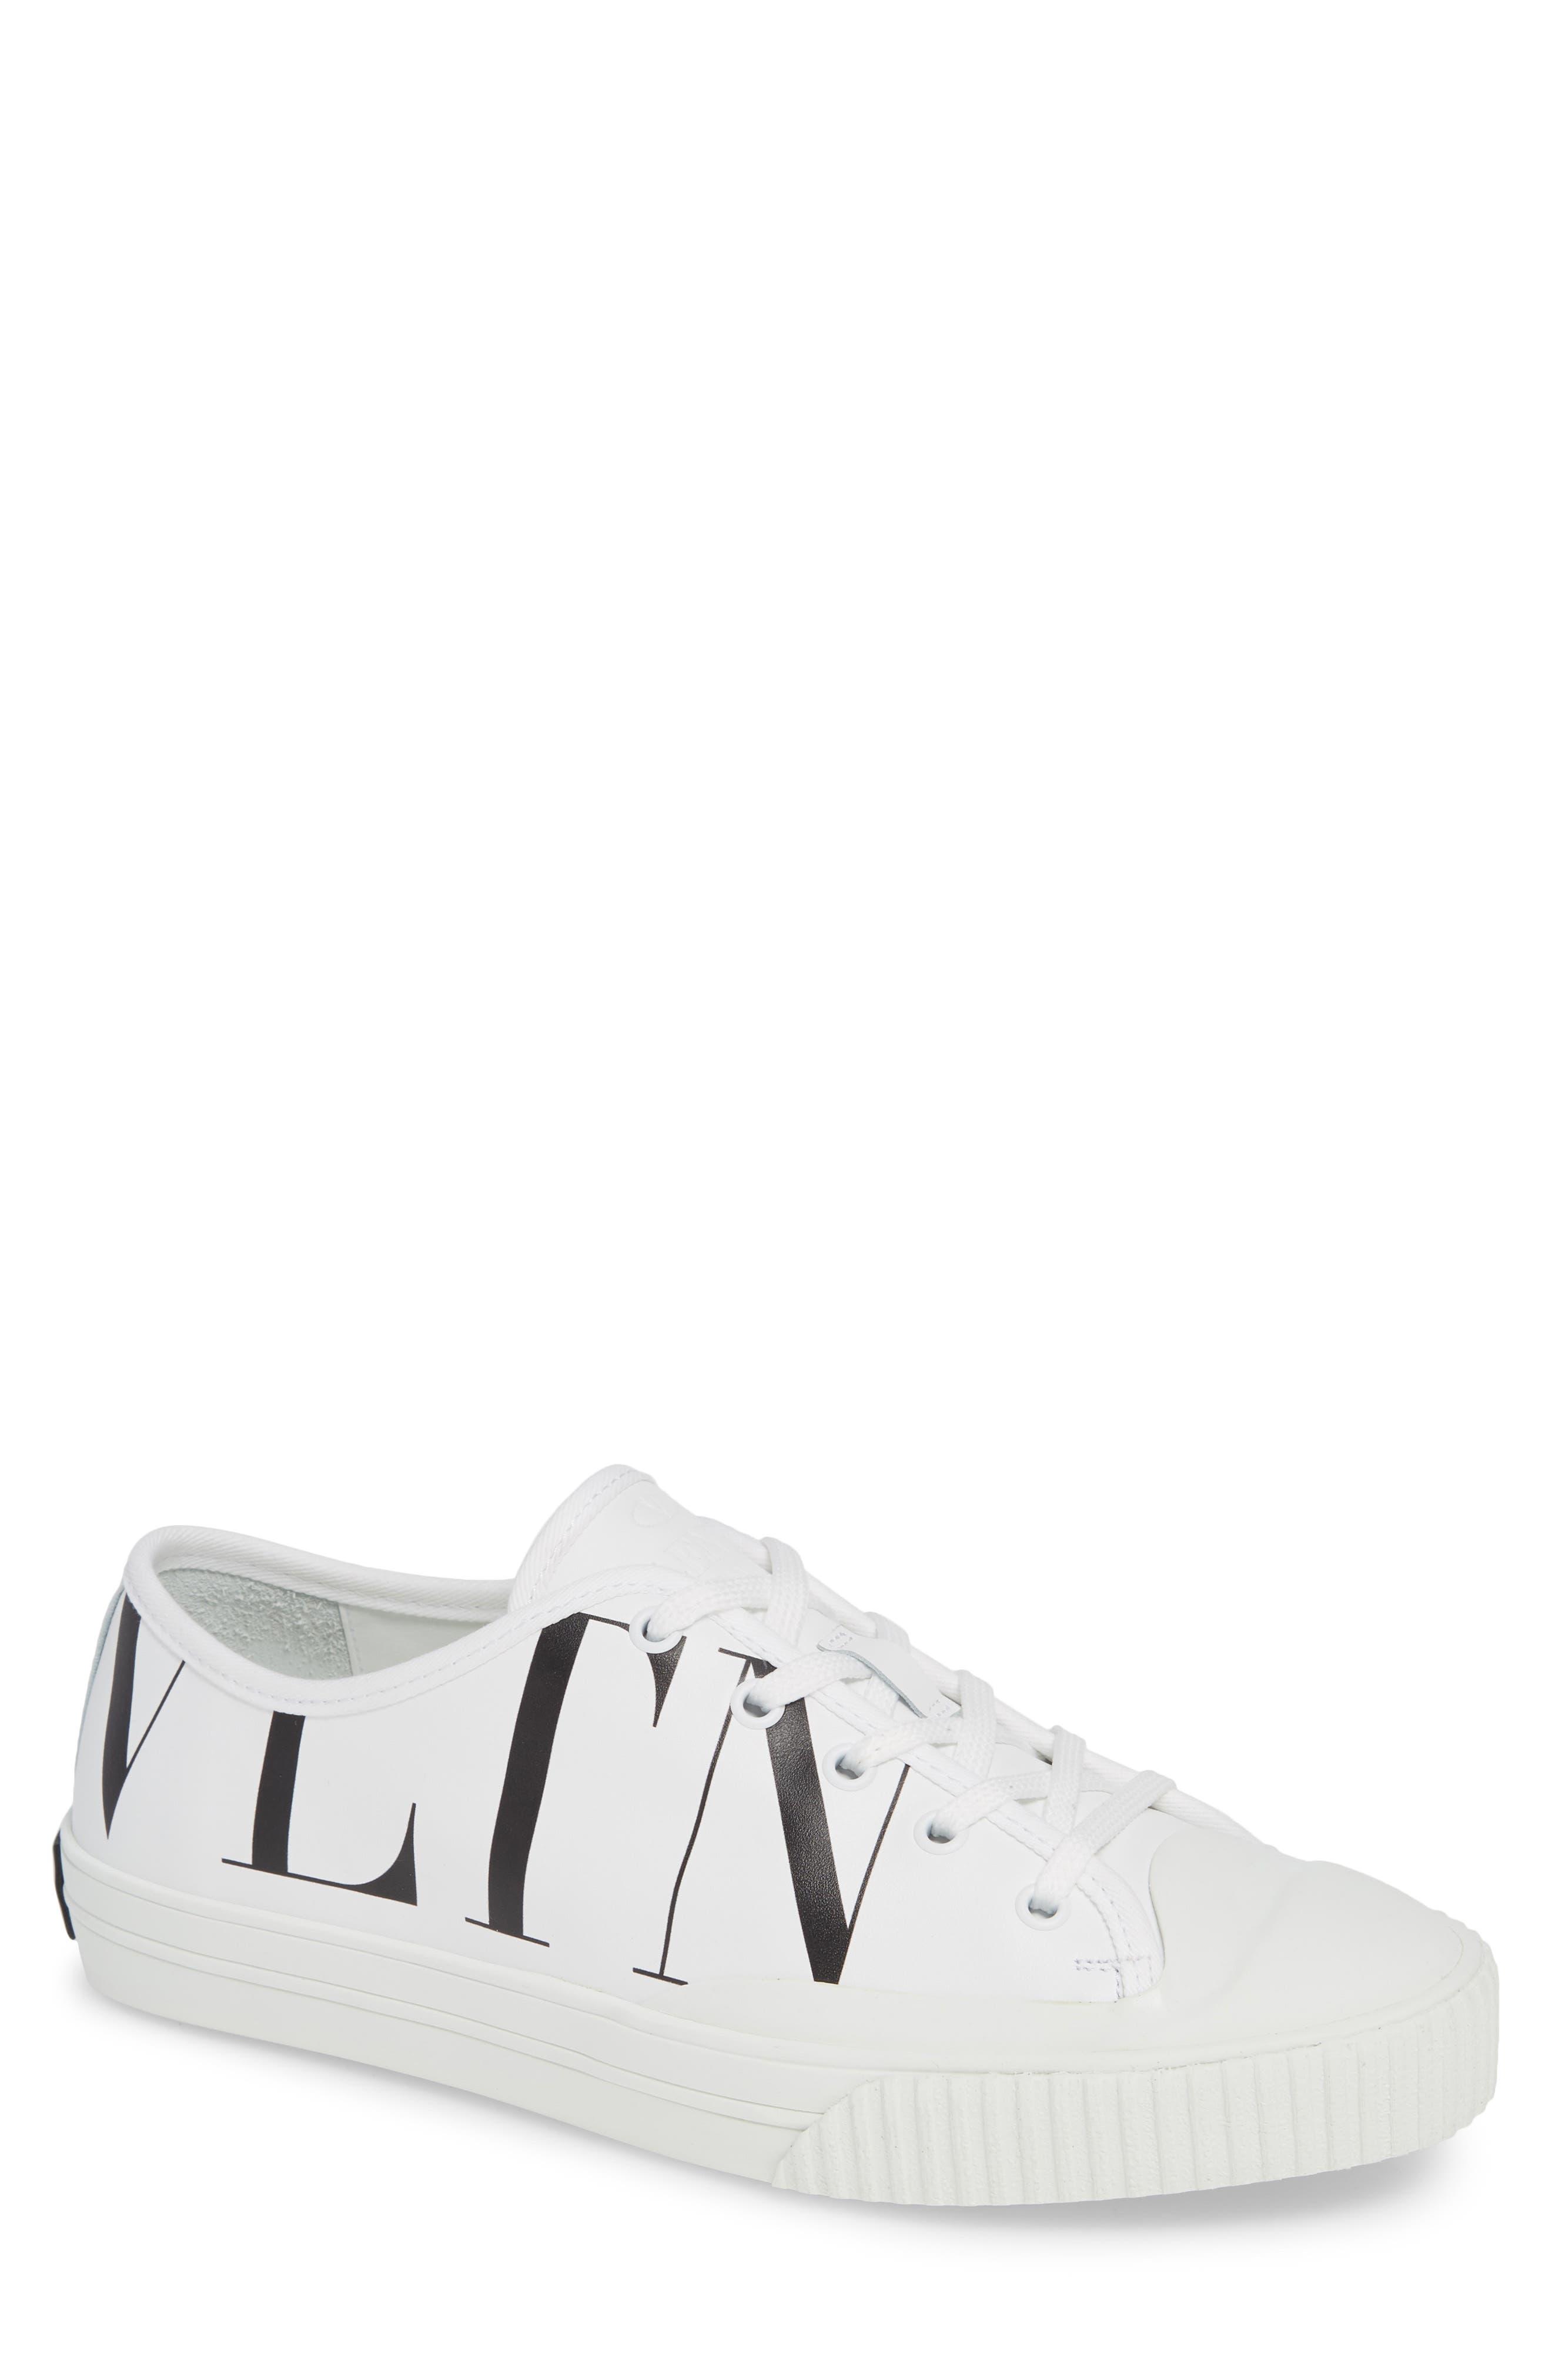 VLTN Low Top Sneaker,                             Main thumbnail 1, color,                             102